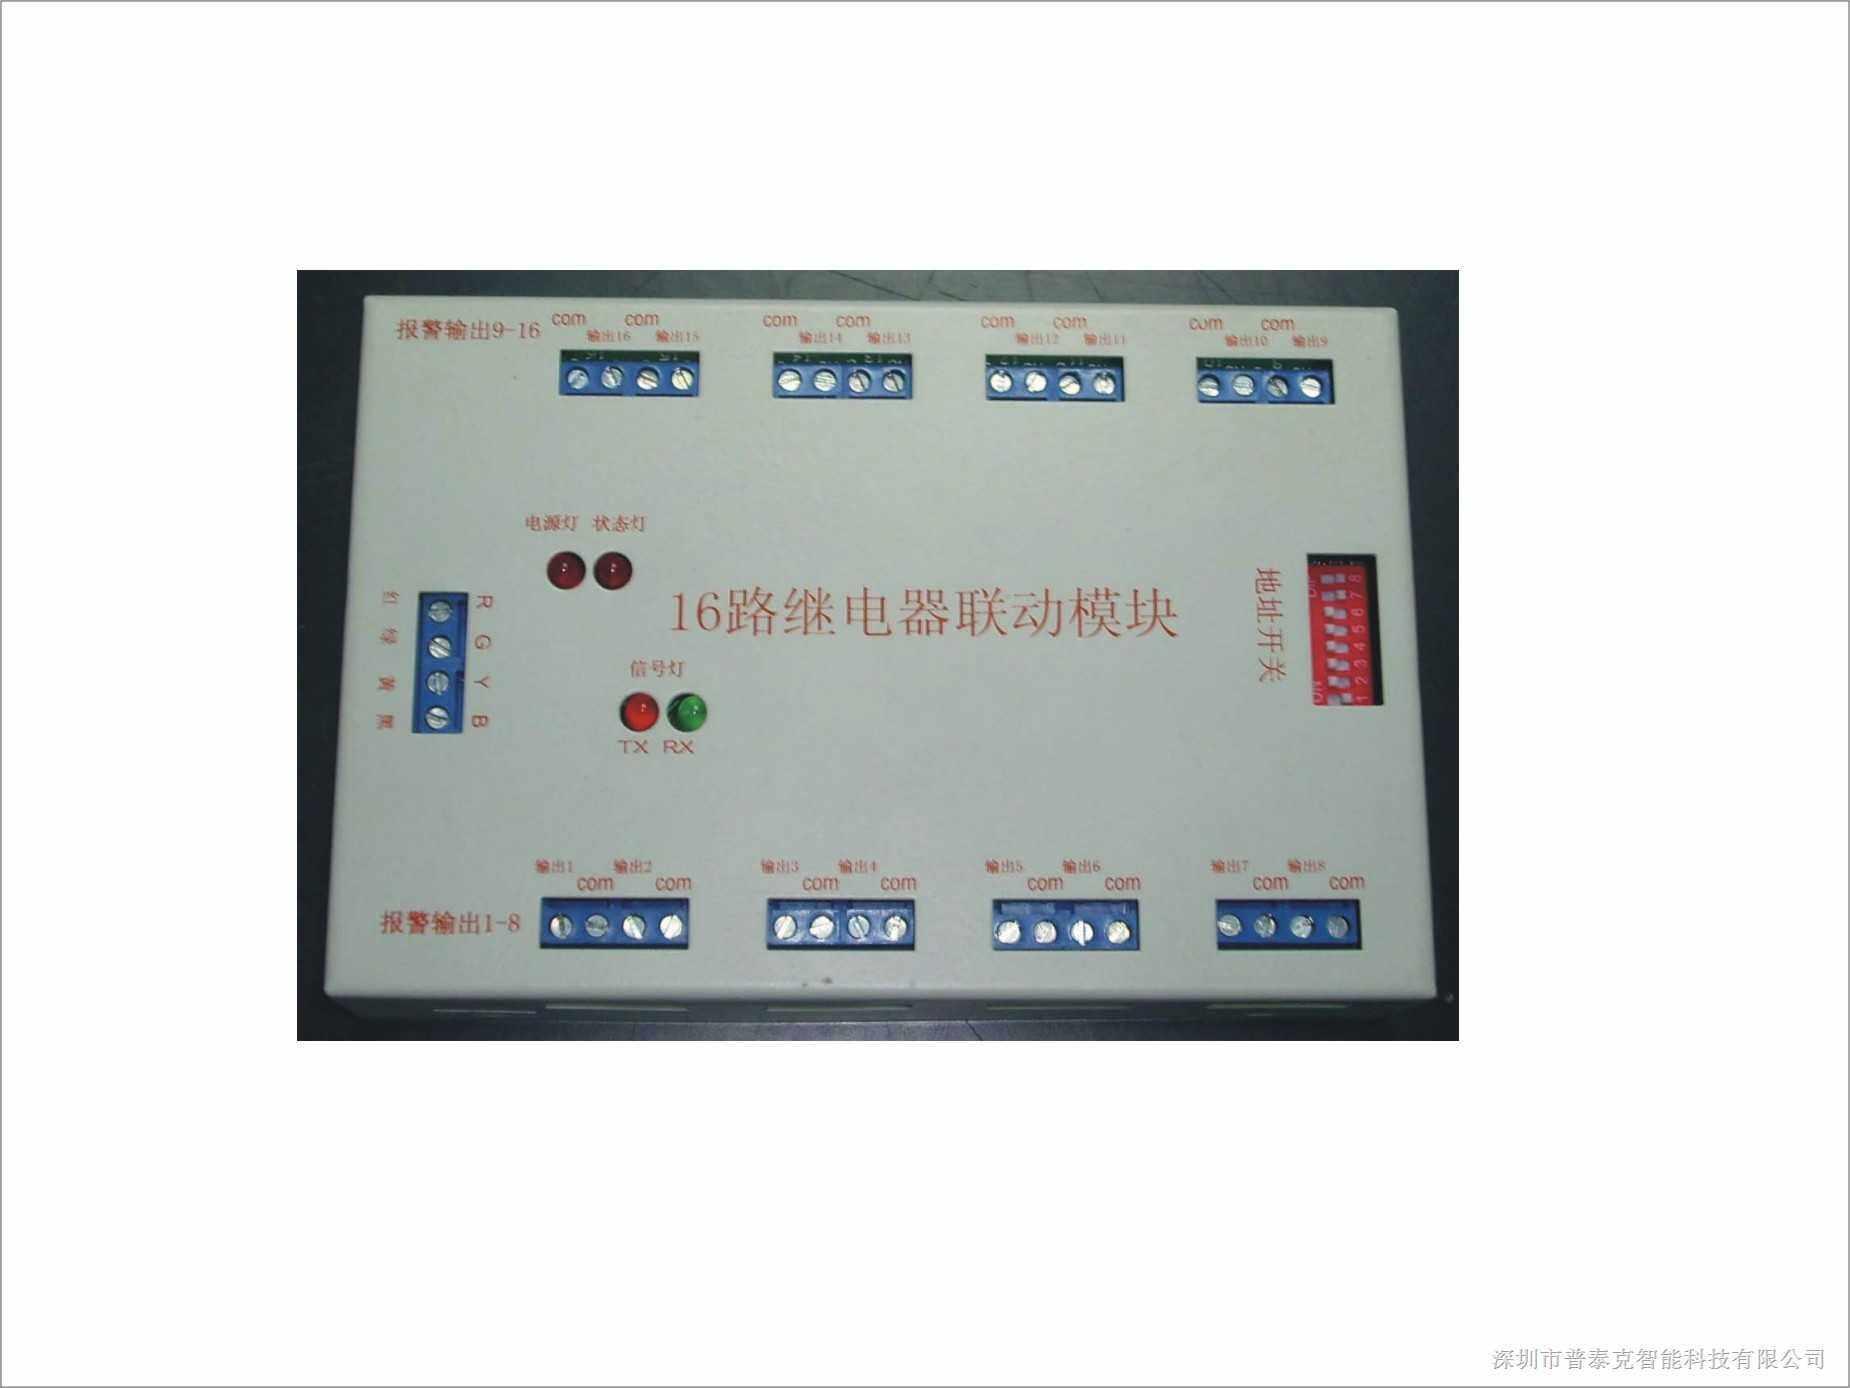 (PTK-16C)16路继电器联动模块